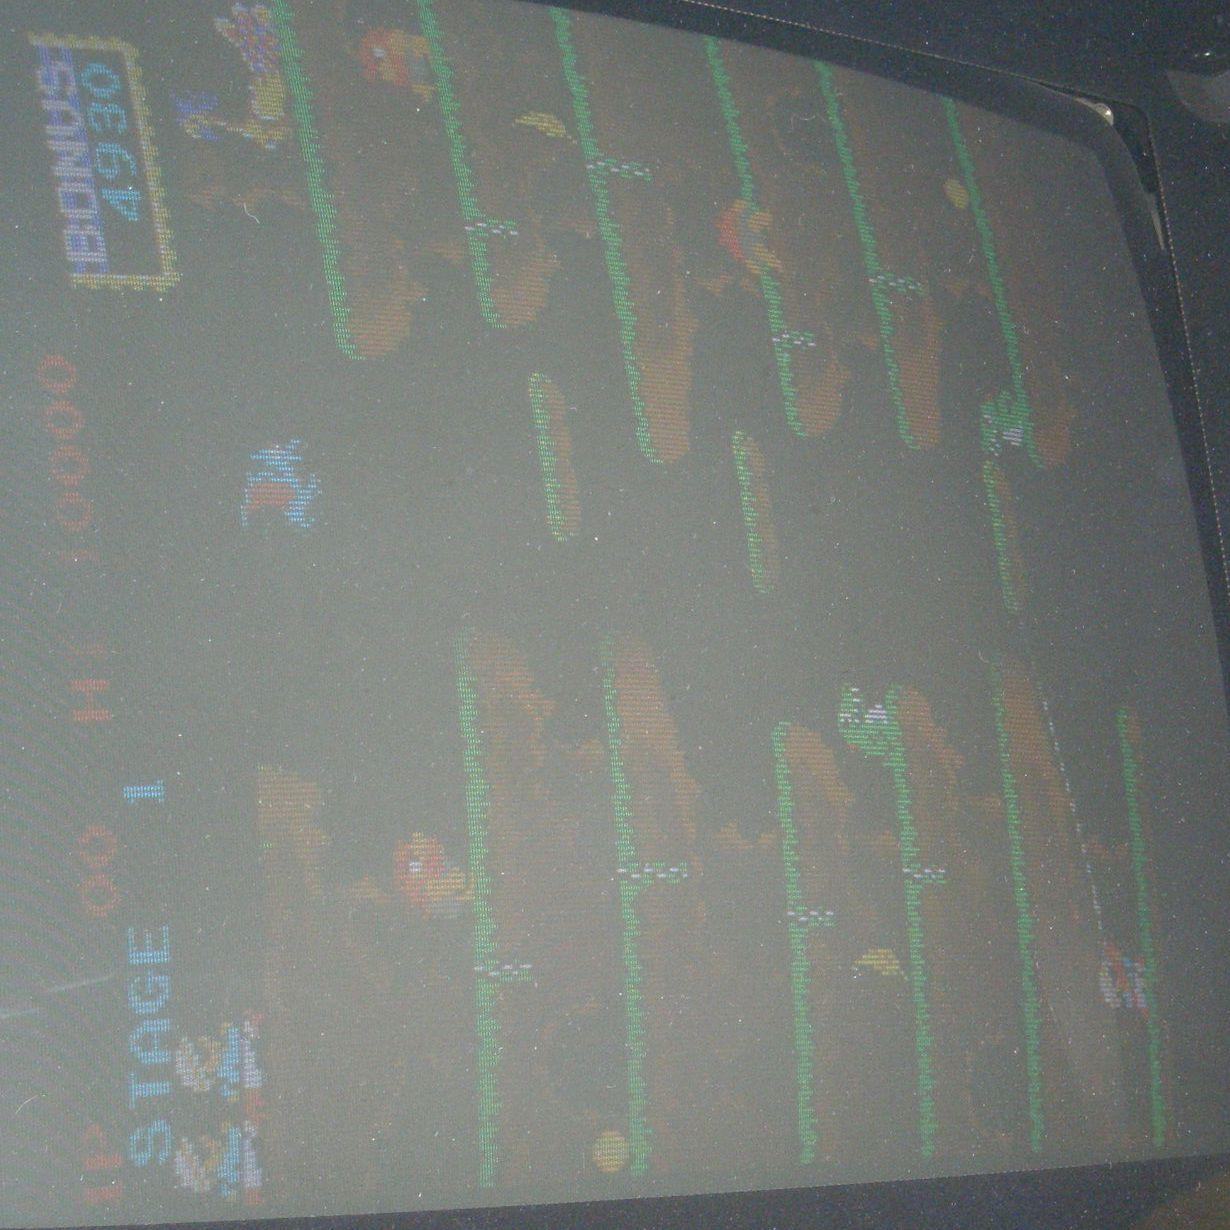 http://arcadius.esero.net/Arcade/Games/Non_Jamma_Fully_Working/Rock_n_Rope_05.jpg